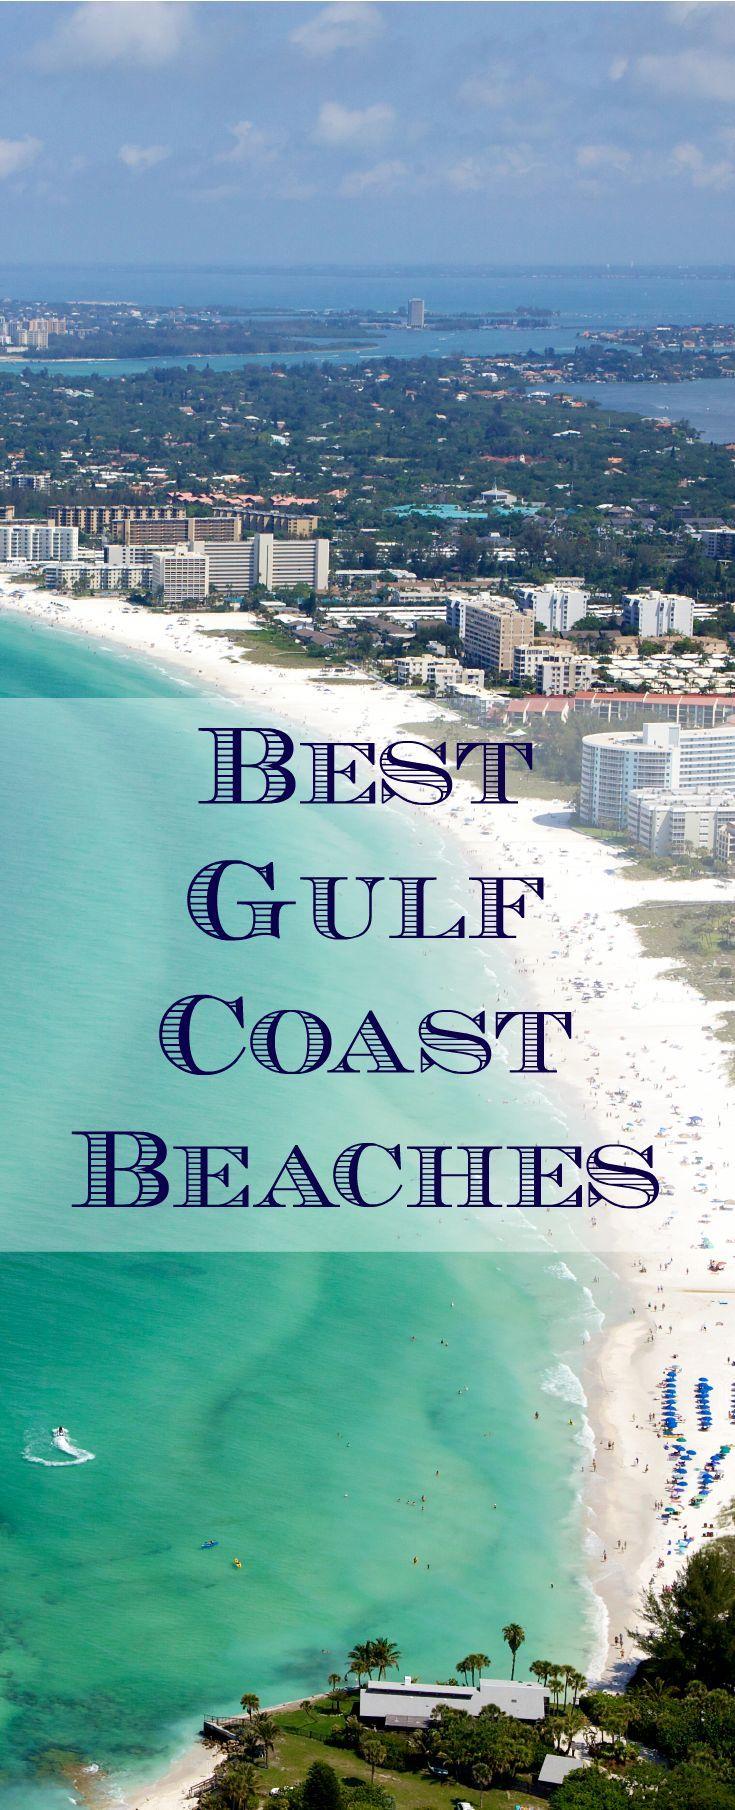 Florida Gulf Coast Road Trip Itinerary Gators Manatees And Pristine Waters Gulf Coast Florida Road Trip Itinerary Road Trip Planning